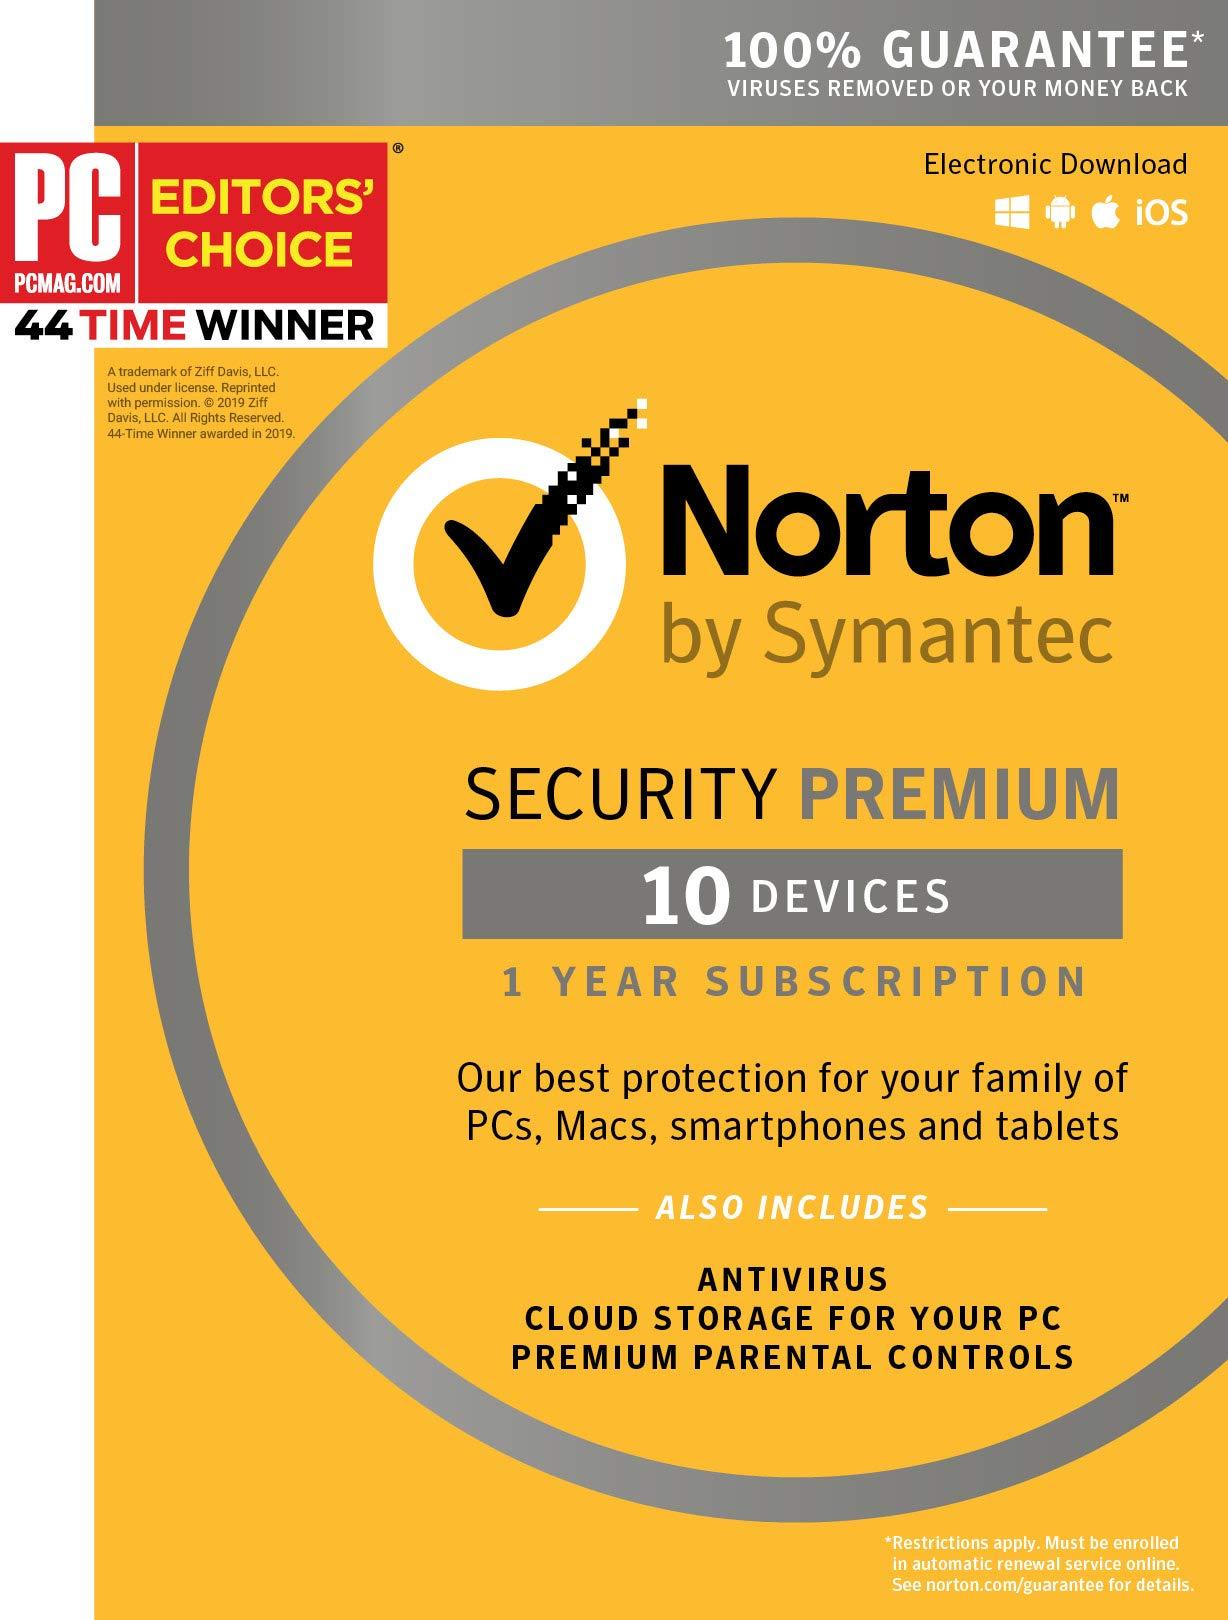 Symantec Norton Security Premium - 10 Devices - 1 Year Subscription [PC/Mac/Mobile Key Card] by Symantec